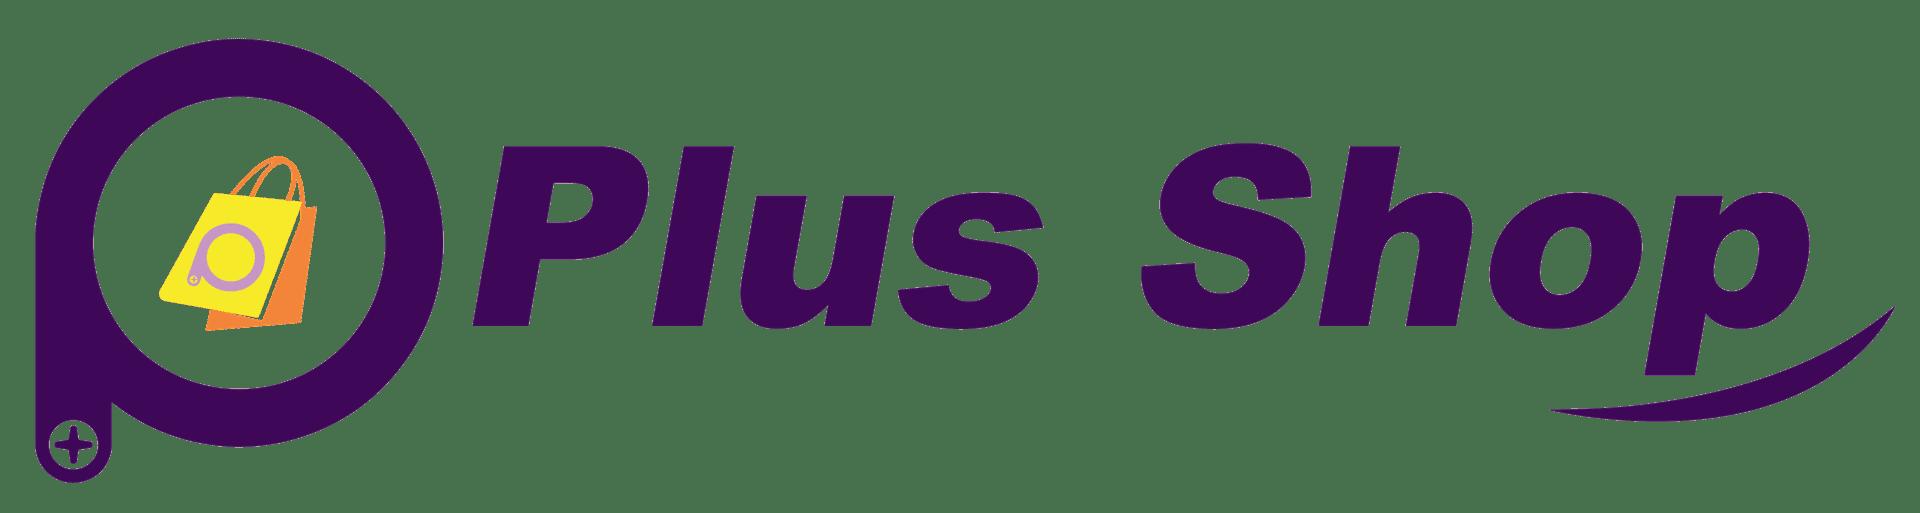 Plus Shop logo